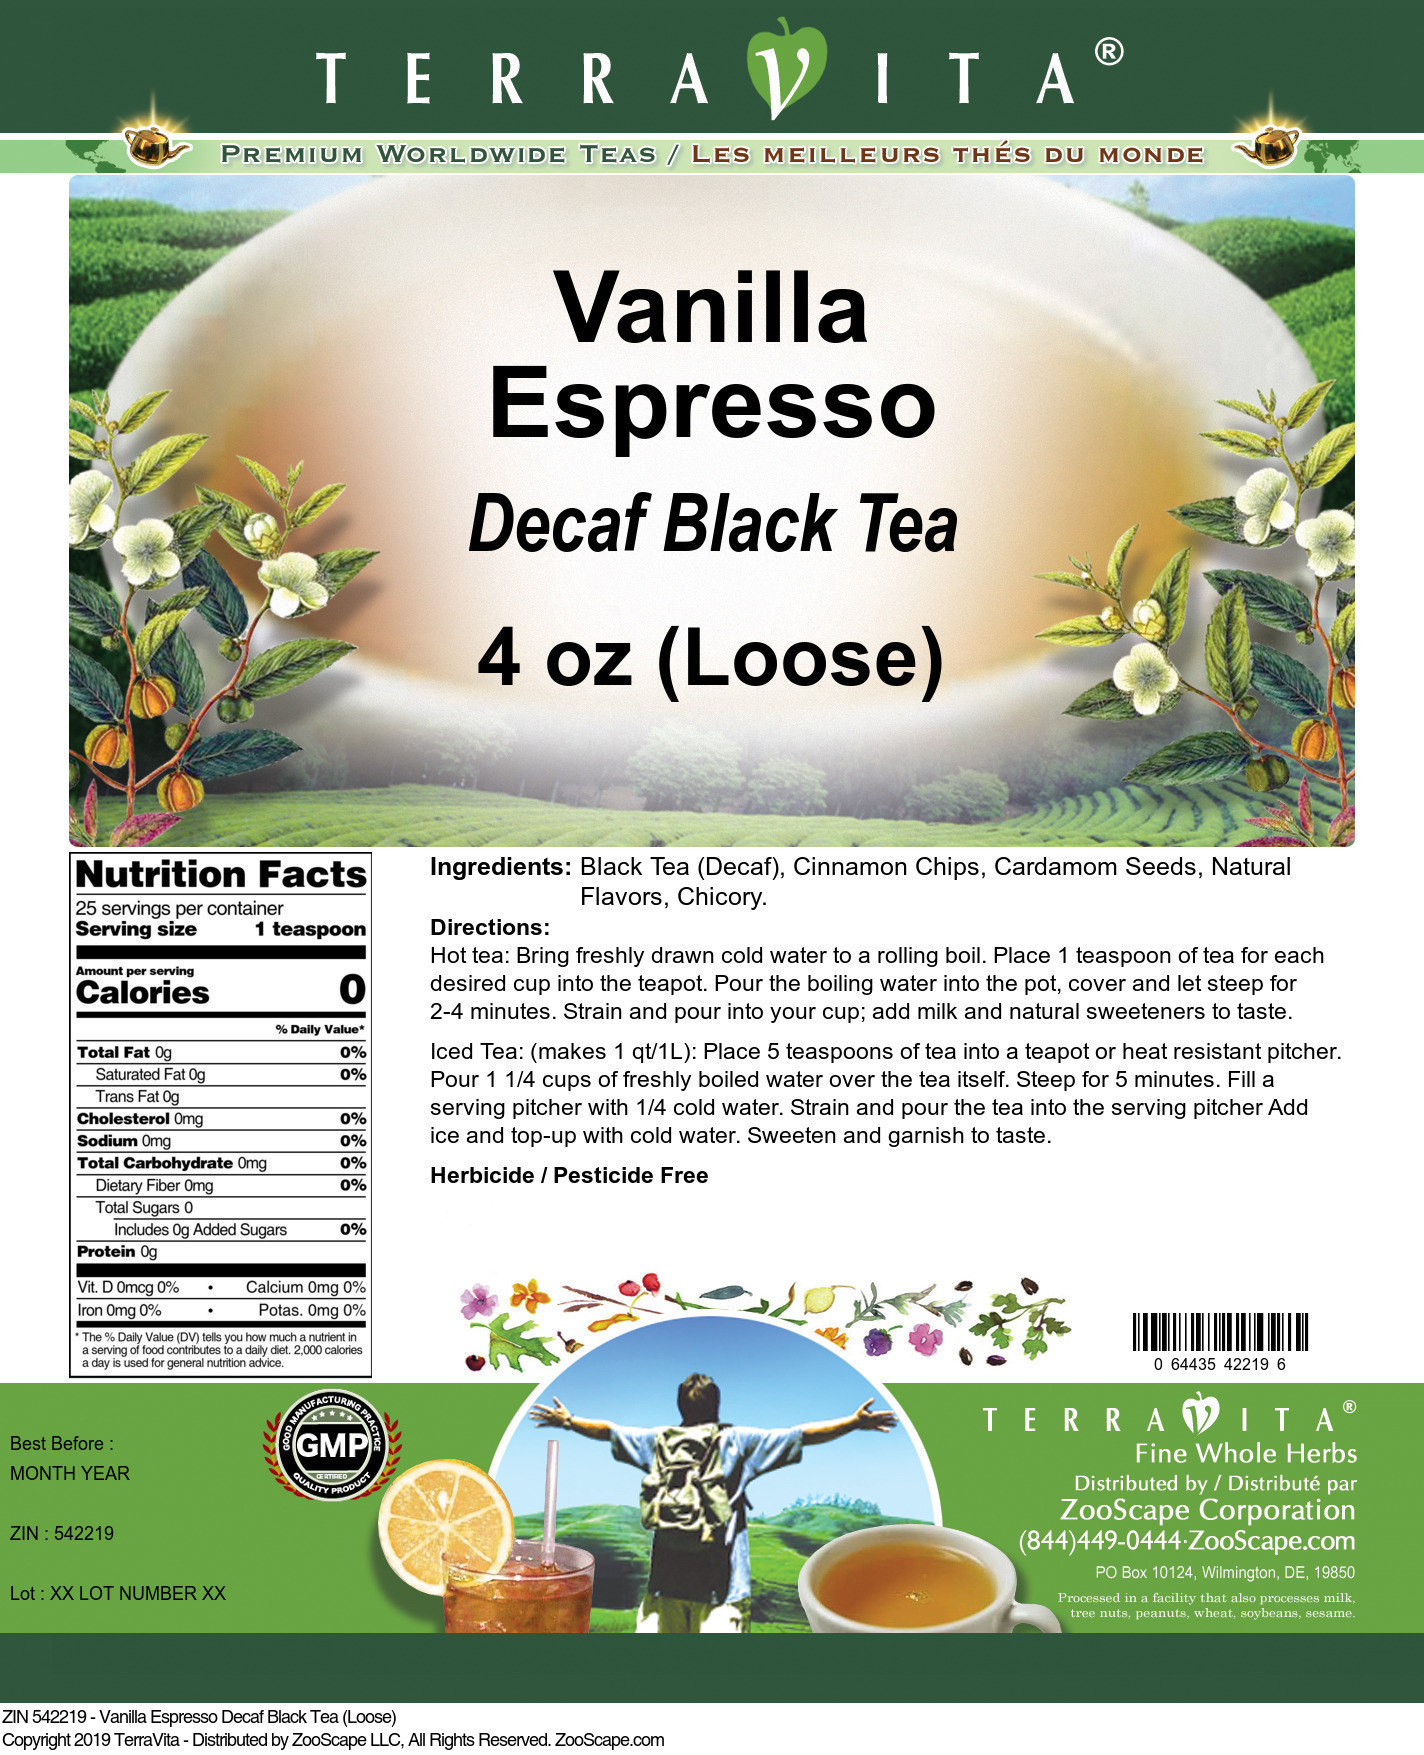 Vanilla Espresso Decaf Black Tea